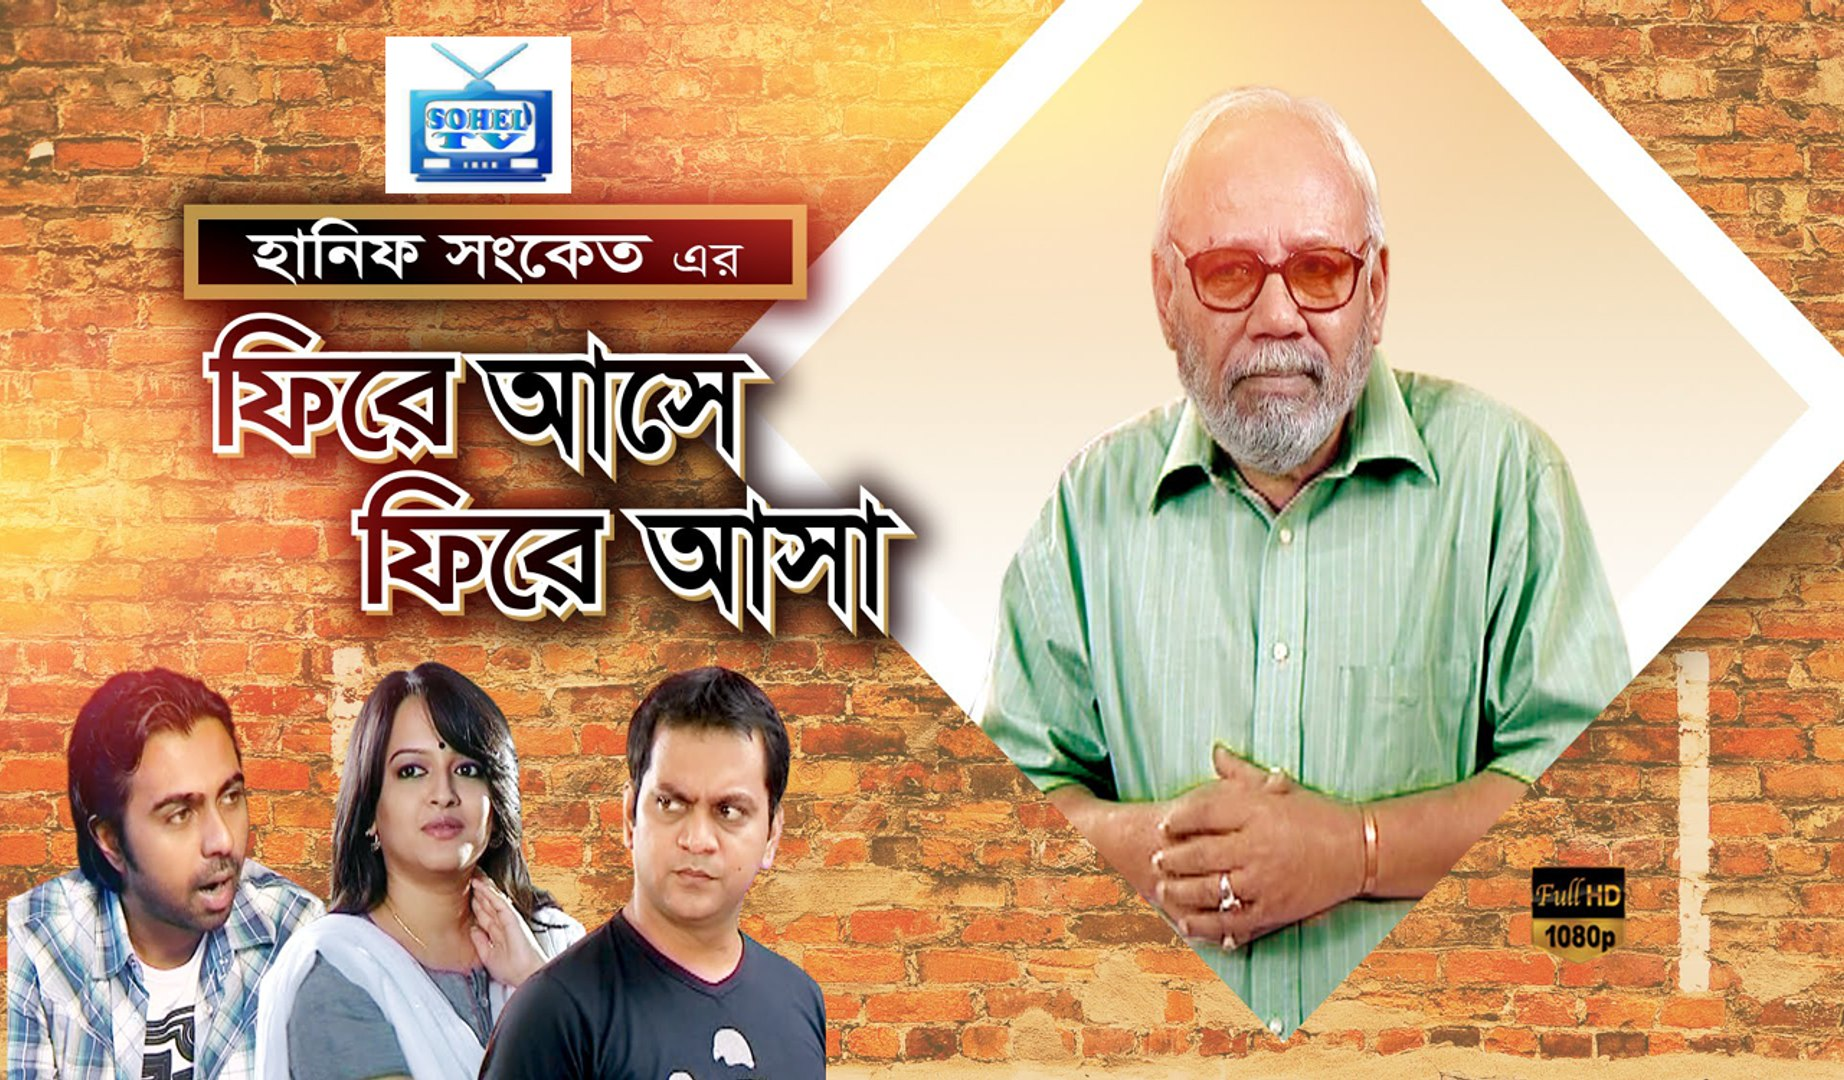 Fire Ashe Fire Asha || Eshita, Apurba, Sabbir - Atm Shamshujjaman | Bangla New Natok 2017